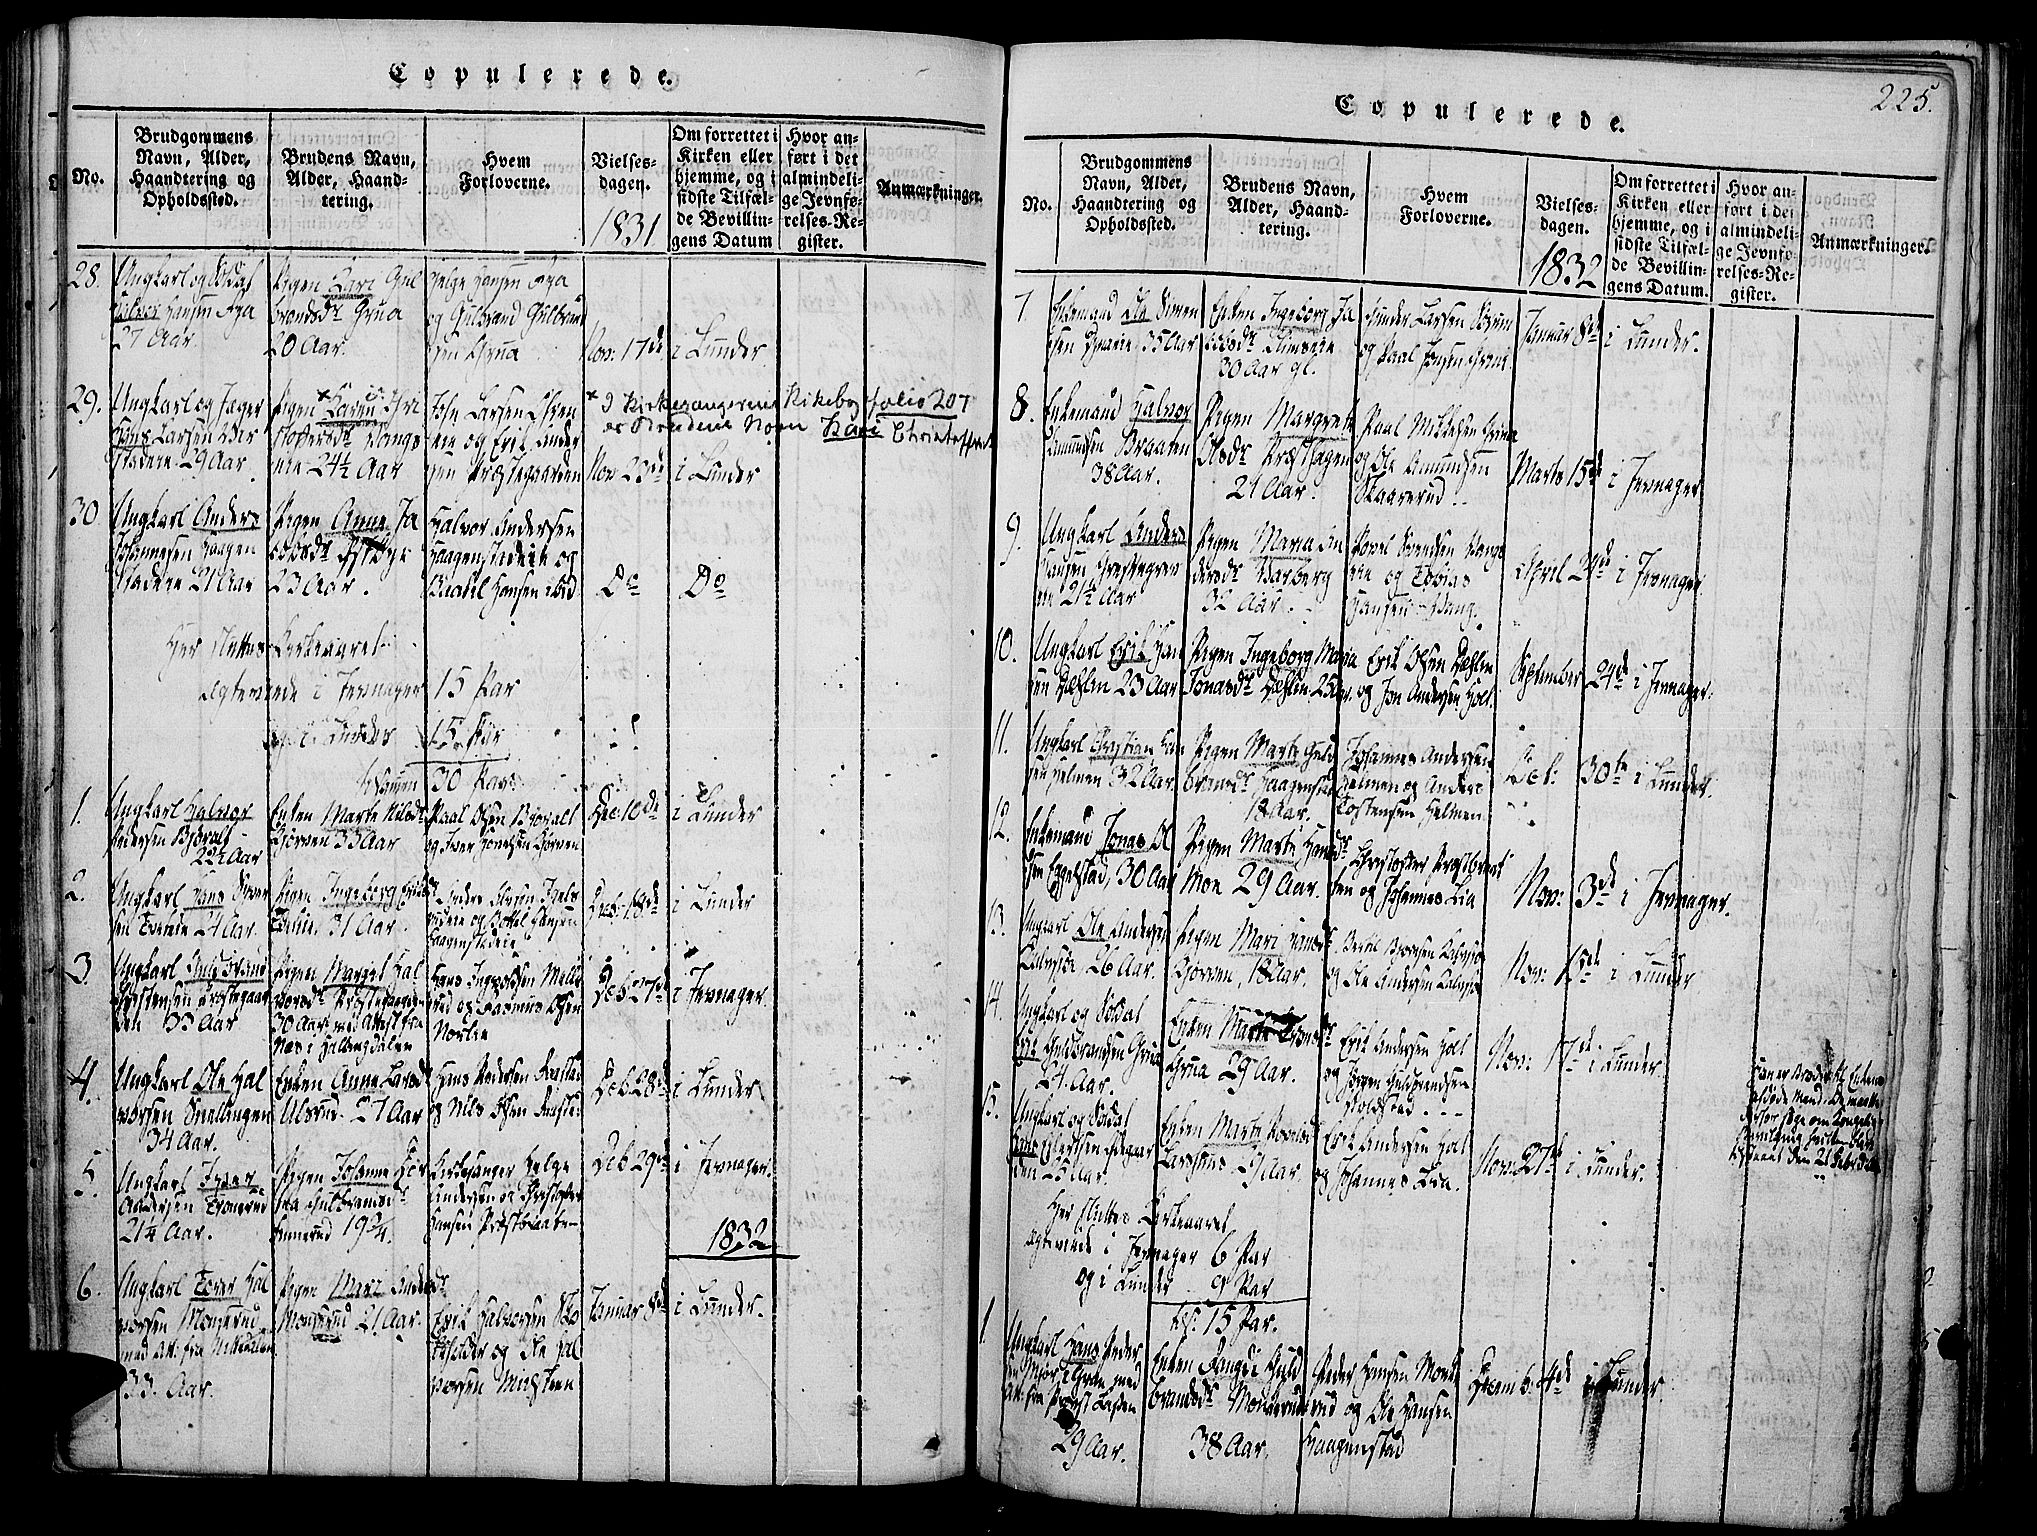 SAH, Jevnaker prestekontor, Ministerialbok nr. 5, 1815-1837, s. 225